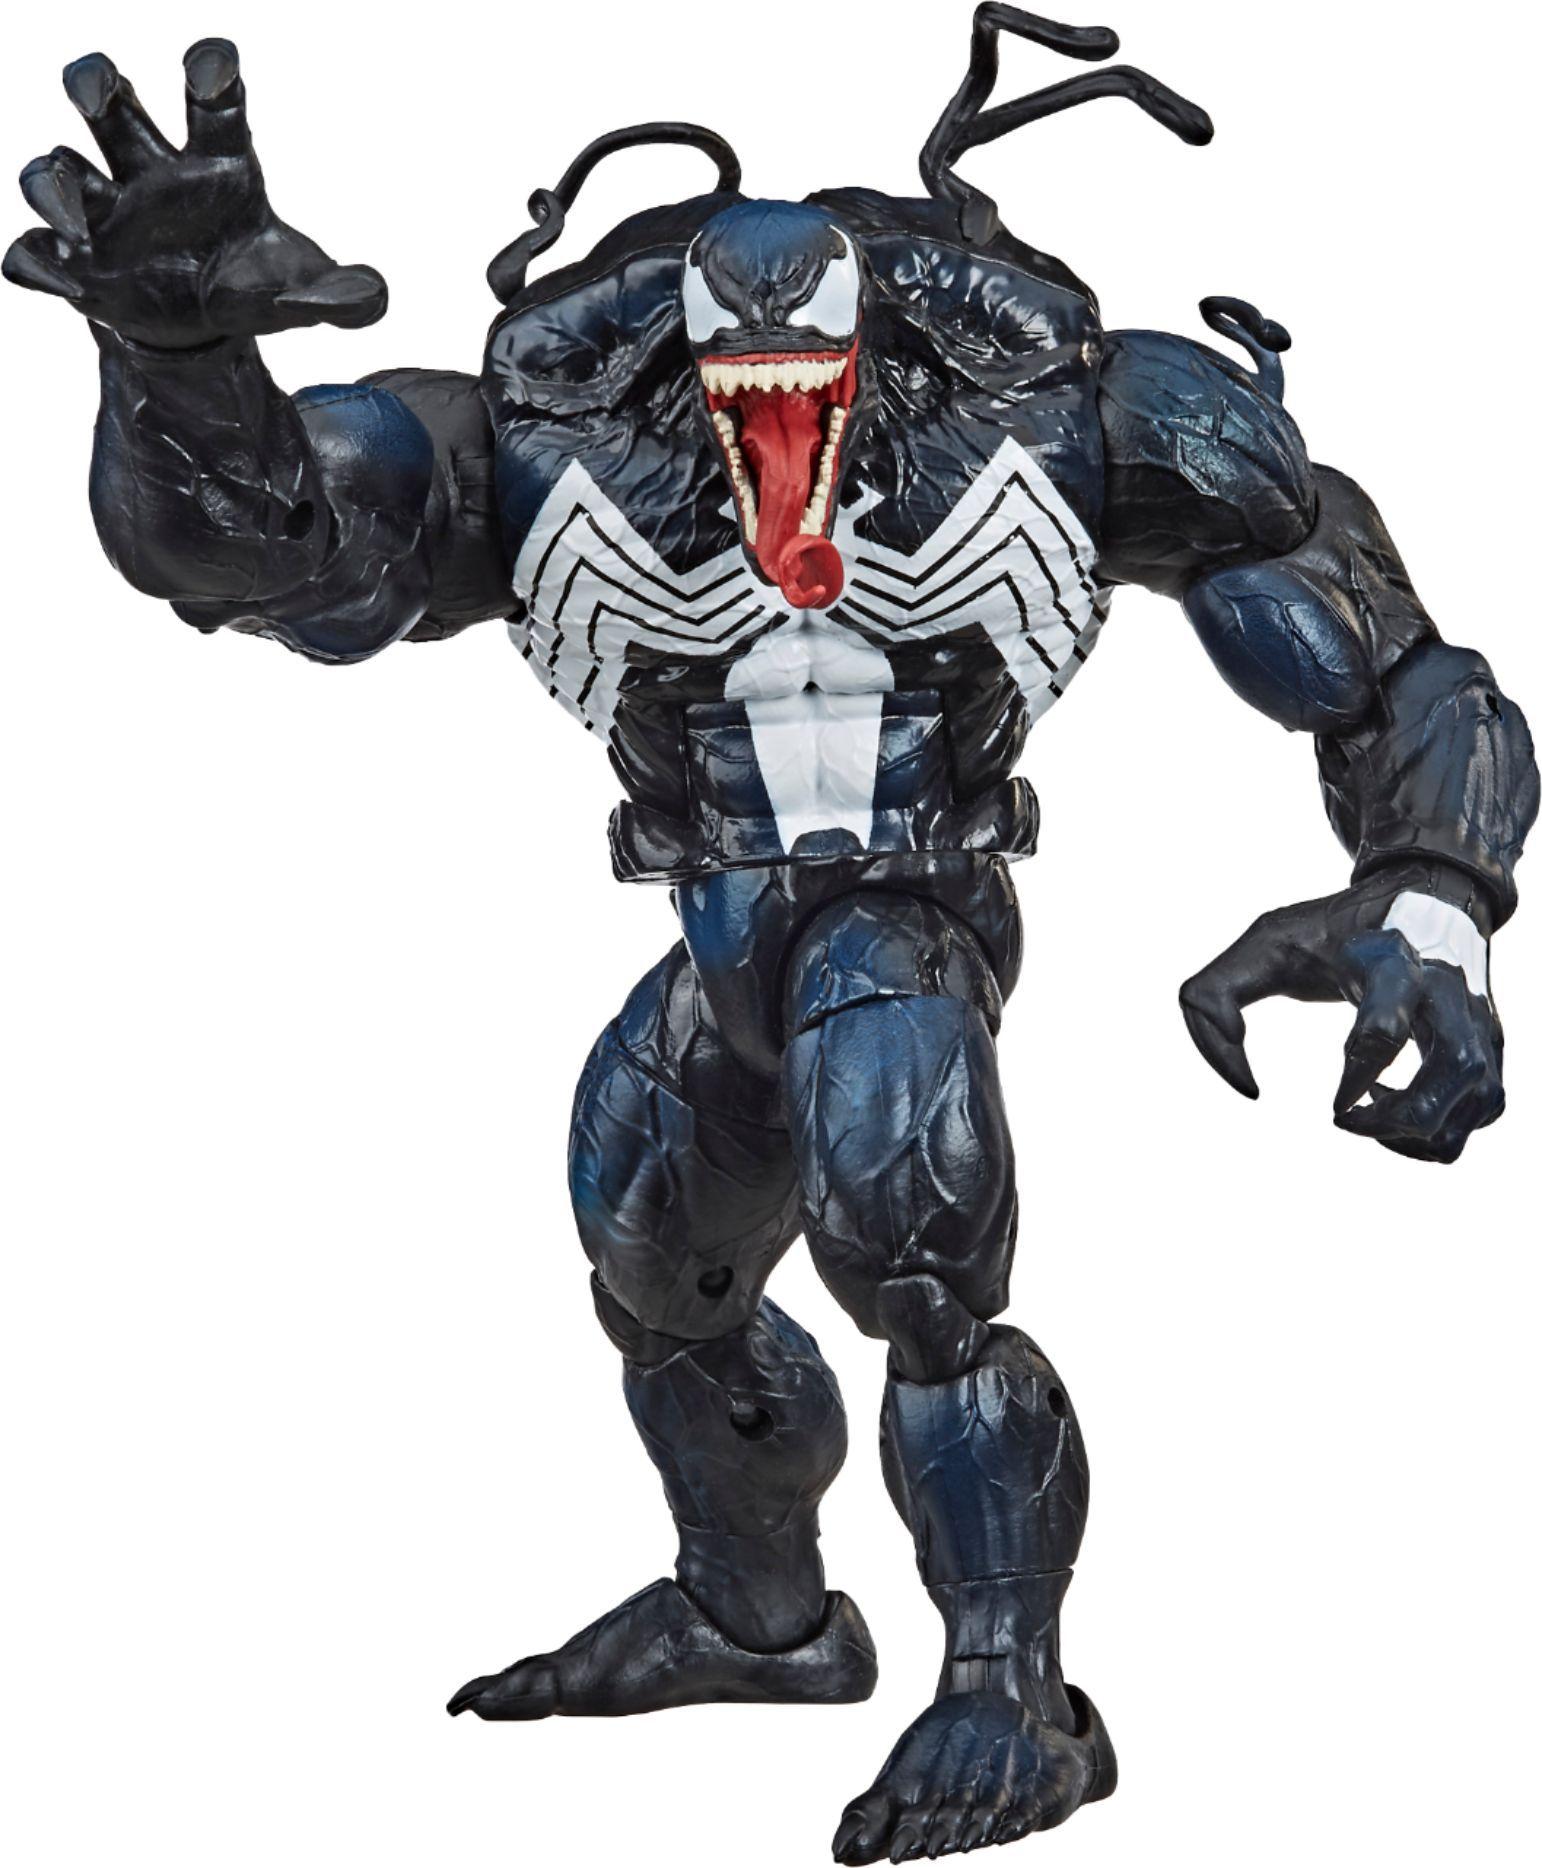 Action Figure Venom: Marvel Comics (Marvel Legends Series) Exclusivo - Hasbro